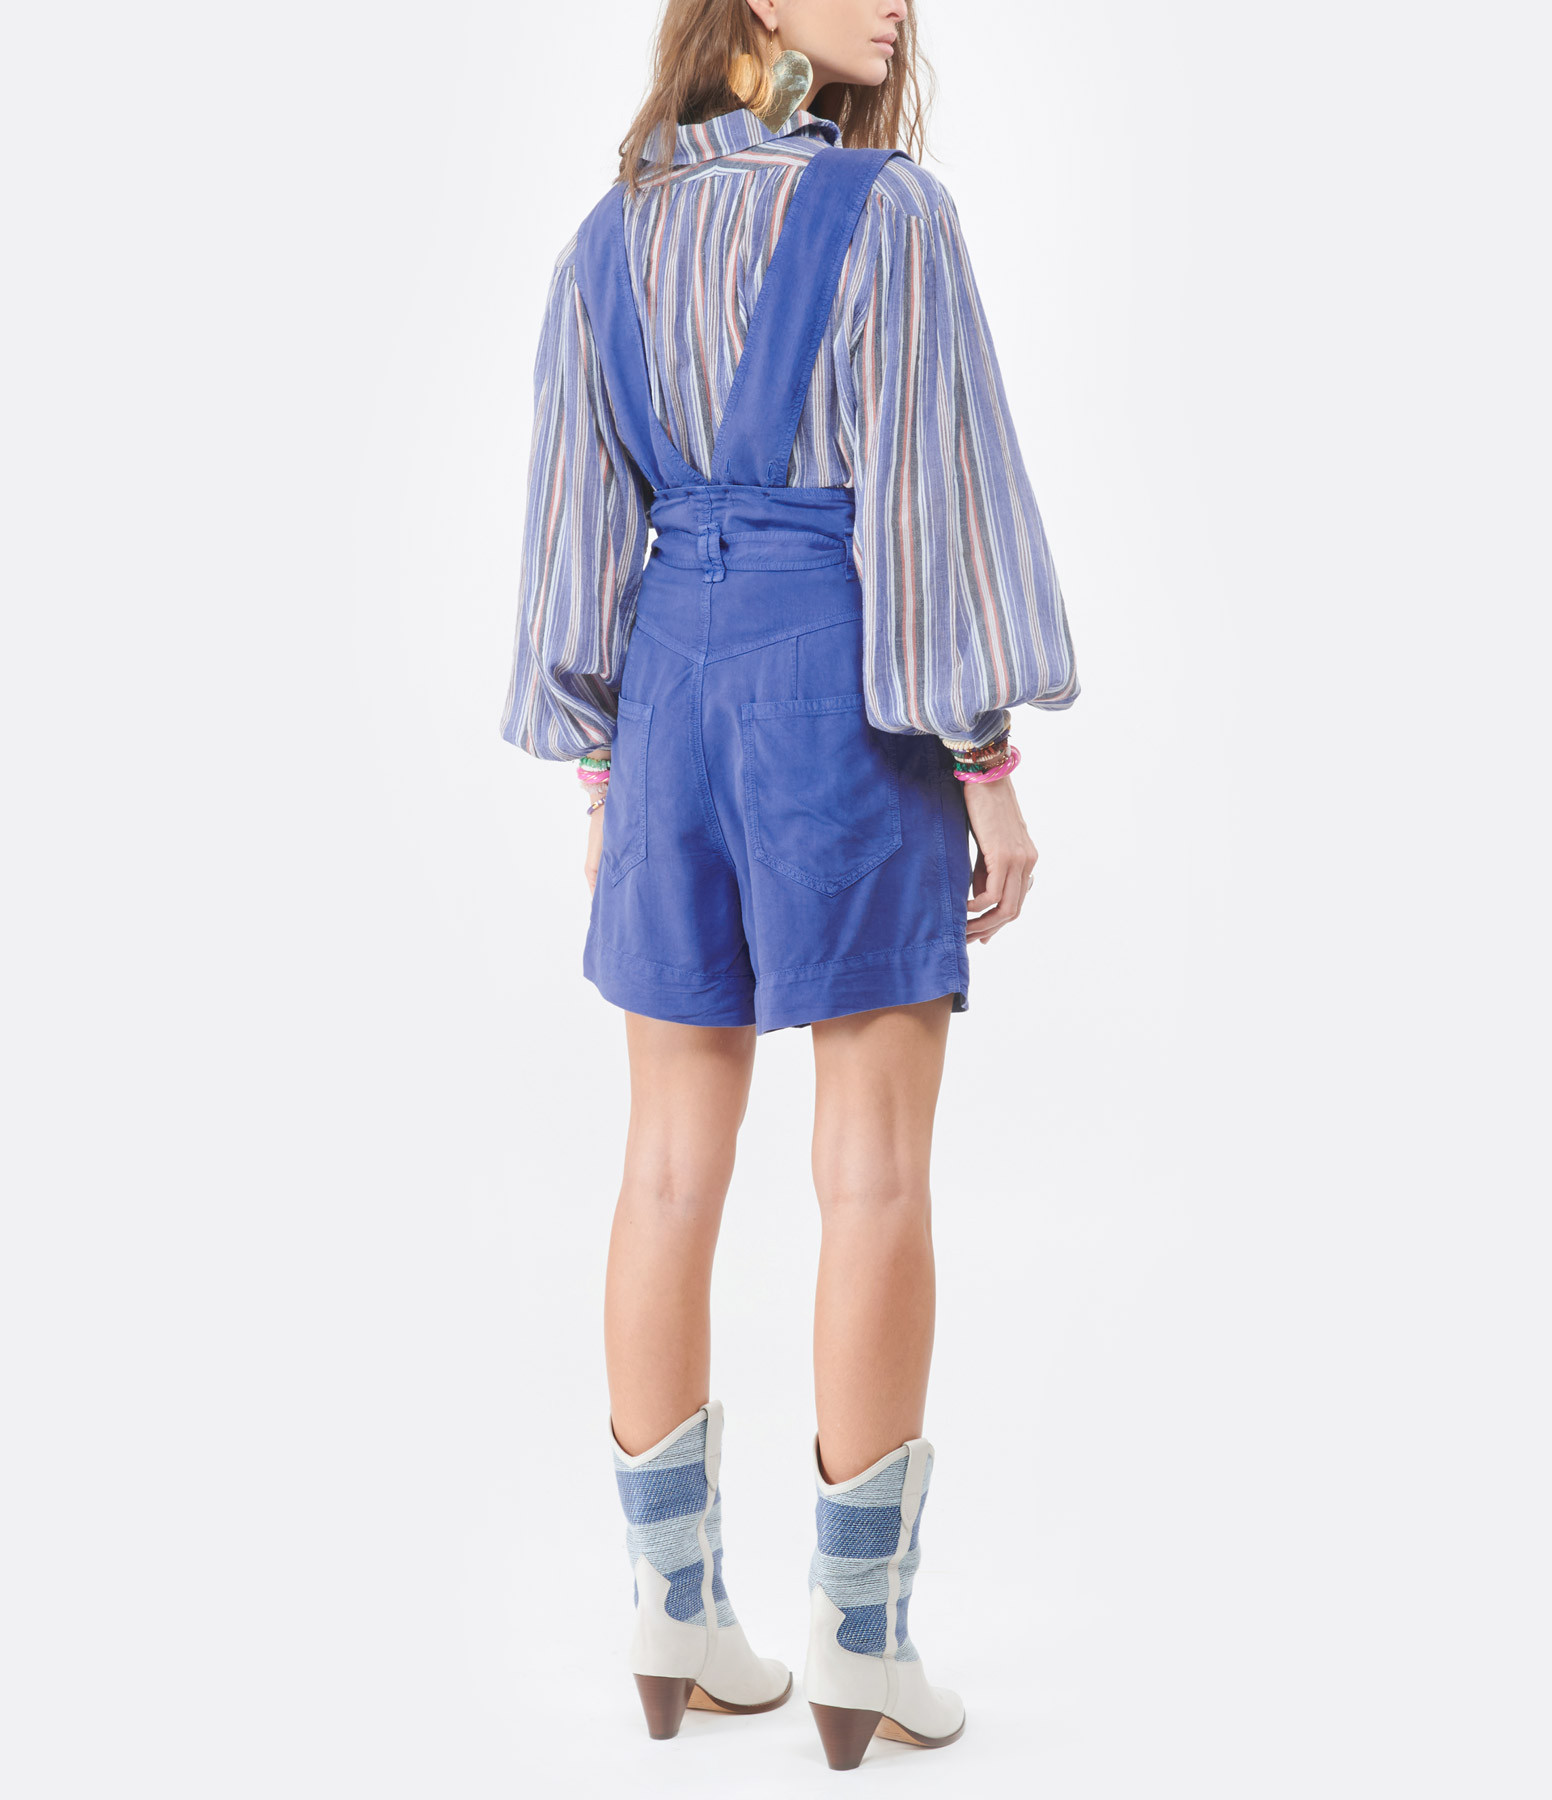 ISABEL MARANT - Short Flink Bleu Électrique